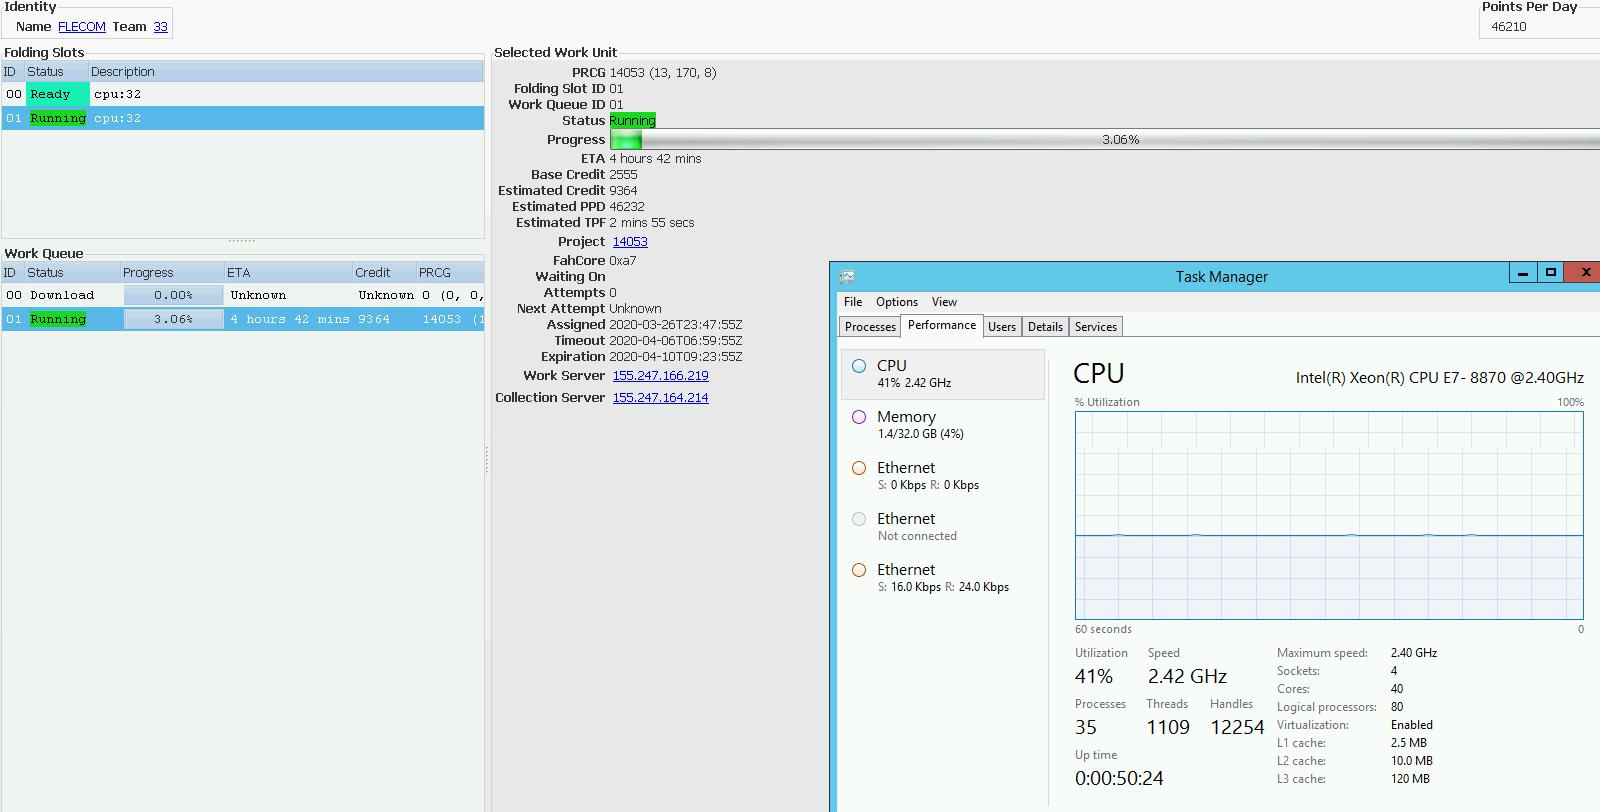 Screenshot_2020-03-26_19-57-18.png